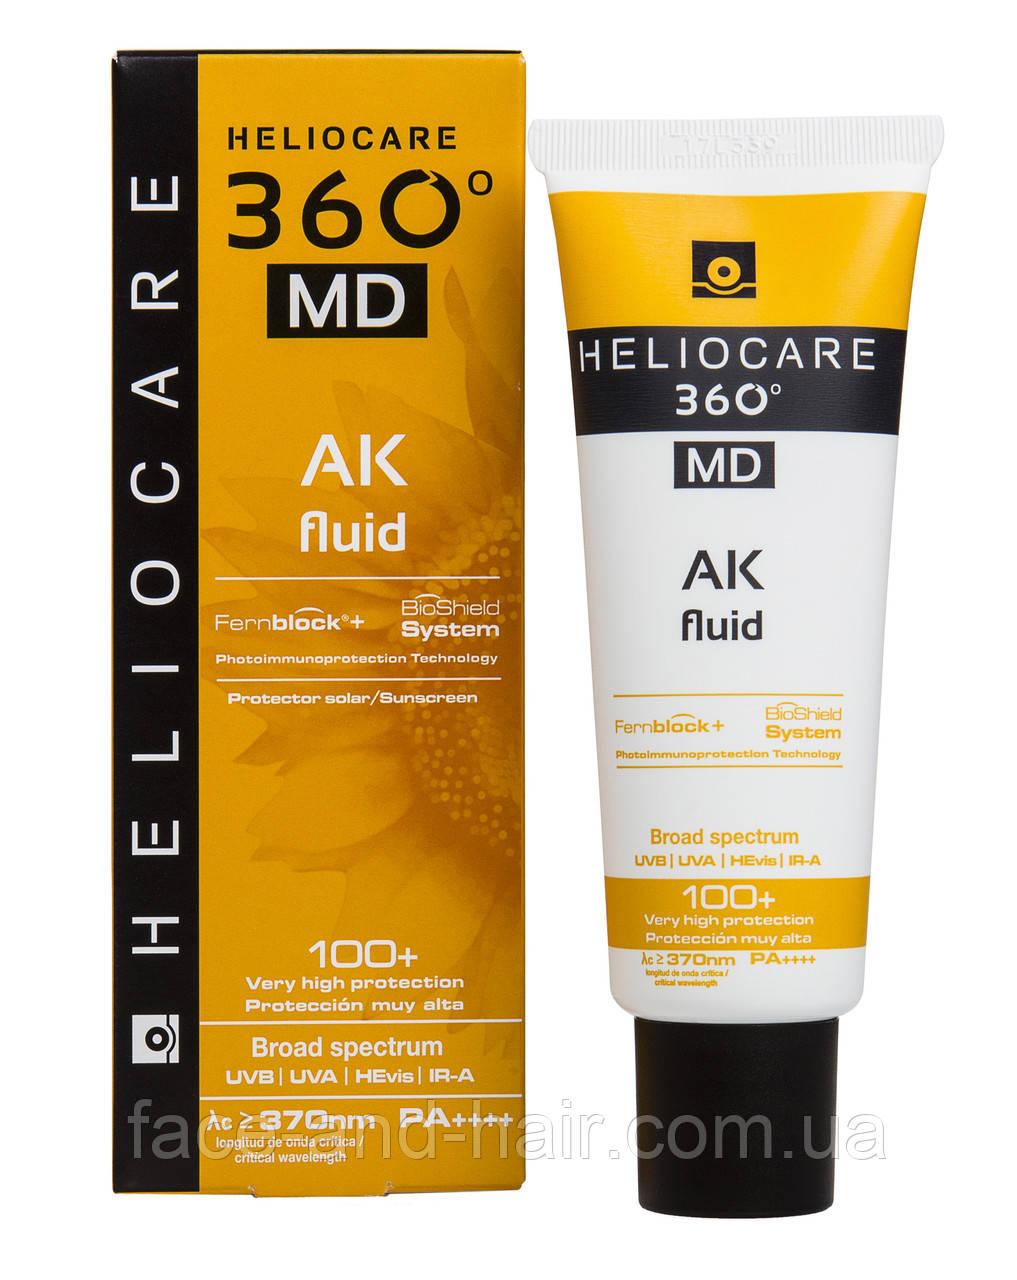 Флюид АК с тотальной защитой SPF 100+ (medical device class I) Cantabria Heliocare 360º MD AK Fluid